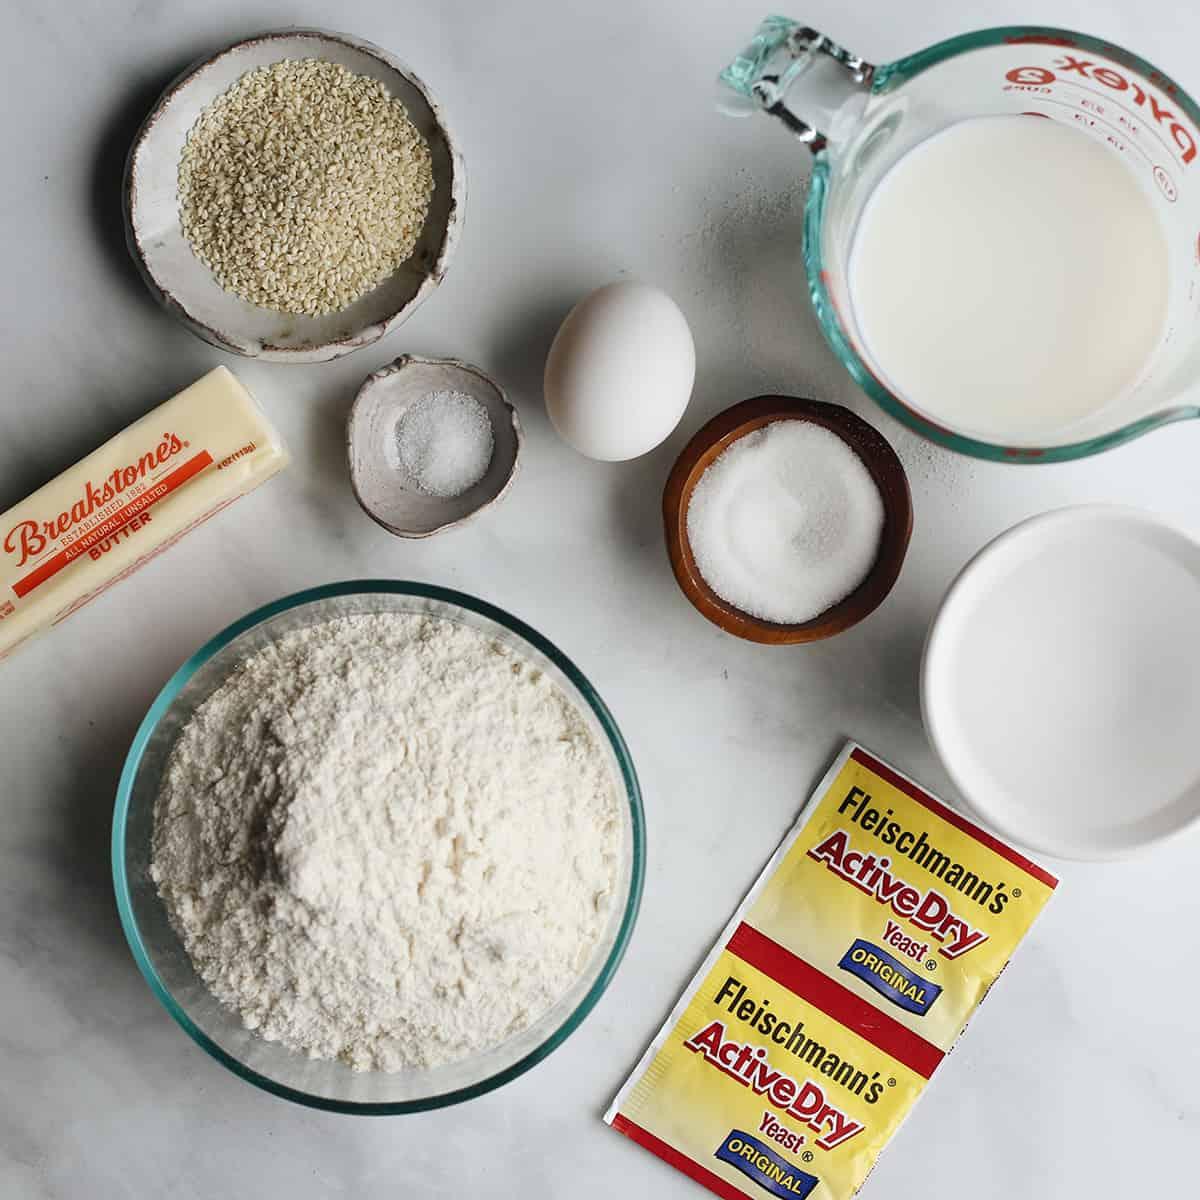 ingredients in this Homemade Hamburger Bun recipe